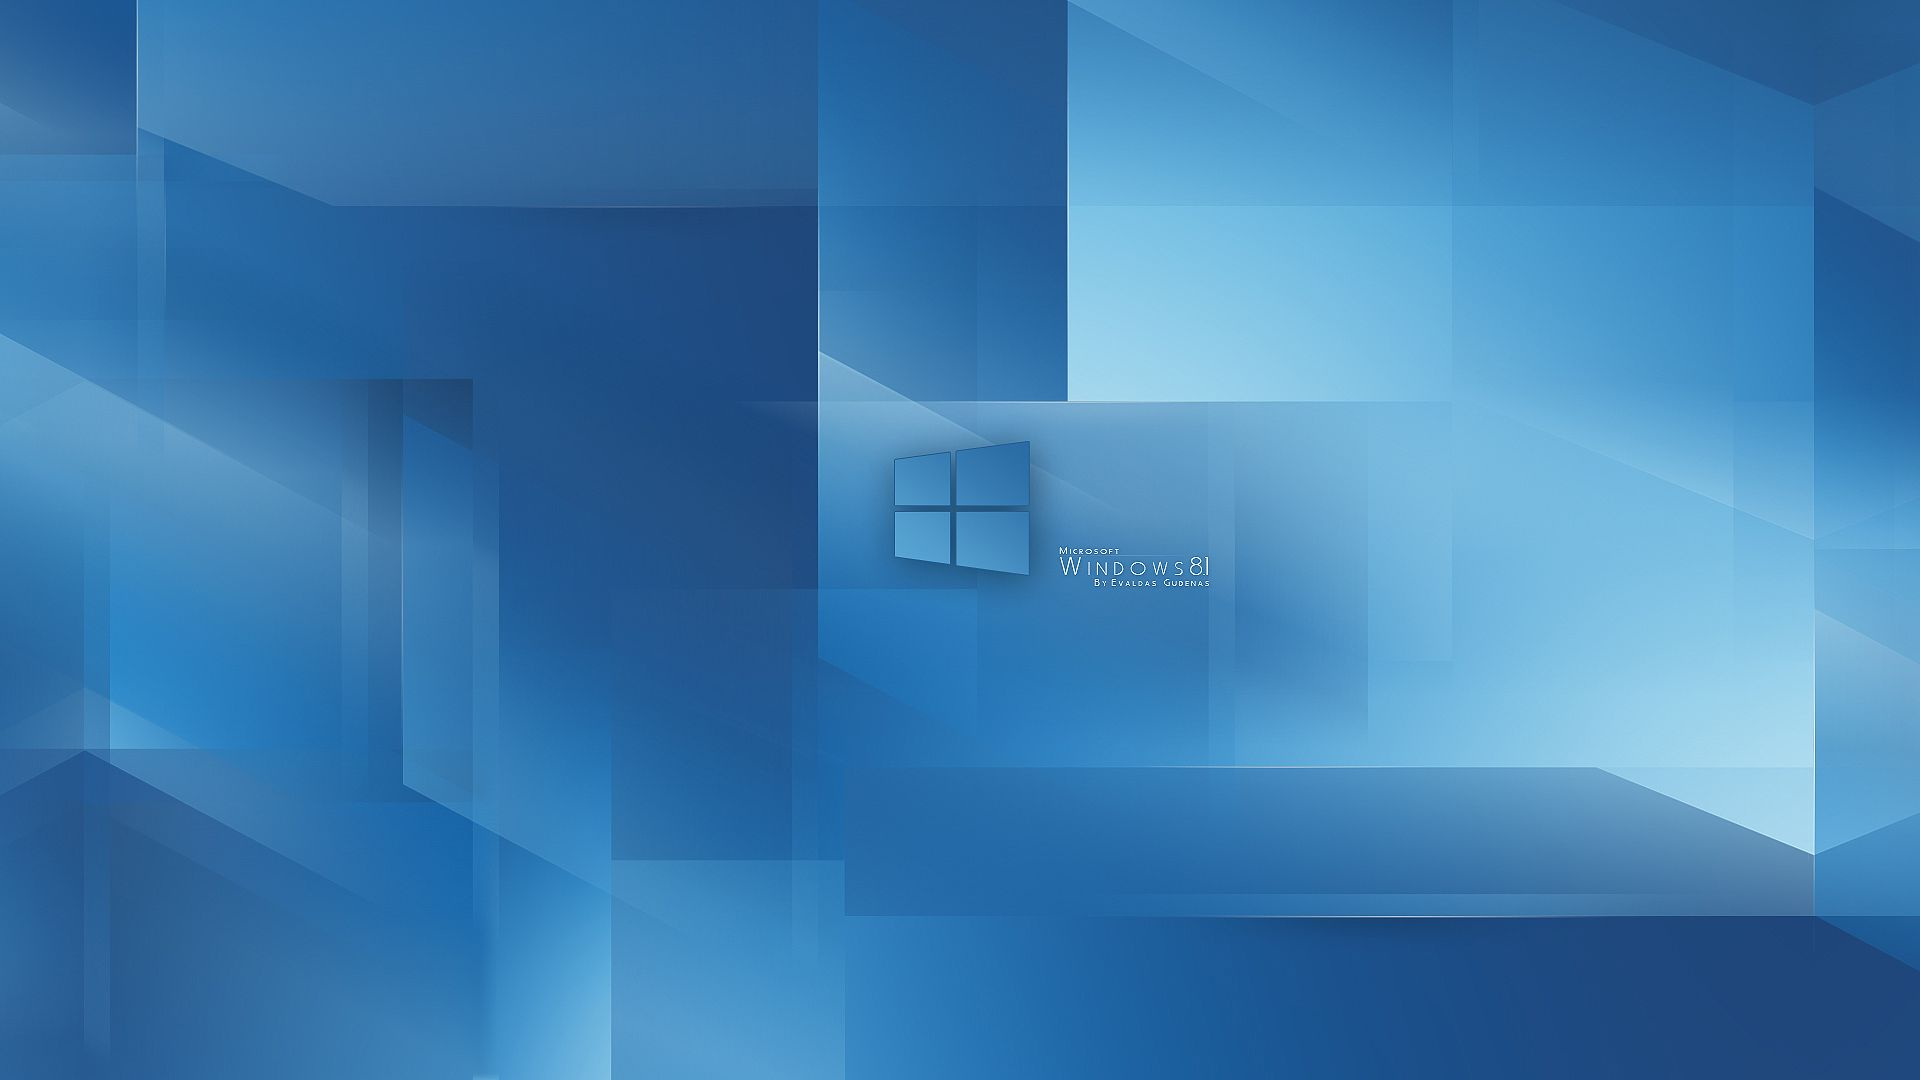 Popular Wallpaper Minecraft Windows 8 - f08ef268fd552168d054a5a56f8914a6  Pictures_28180.jpg